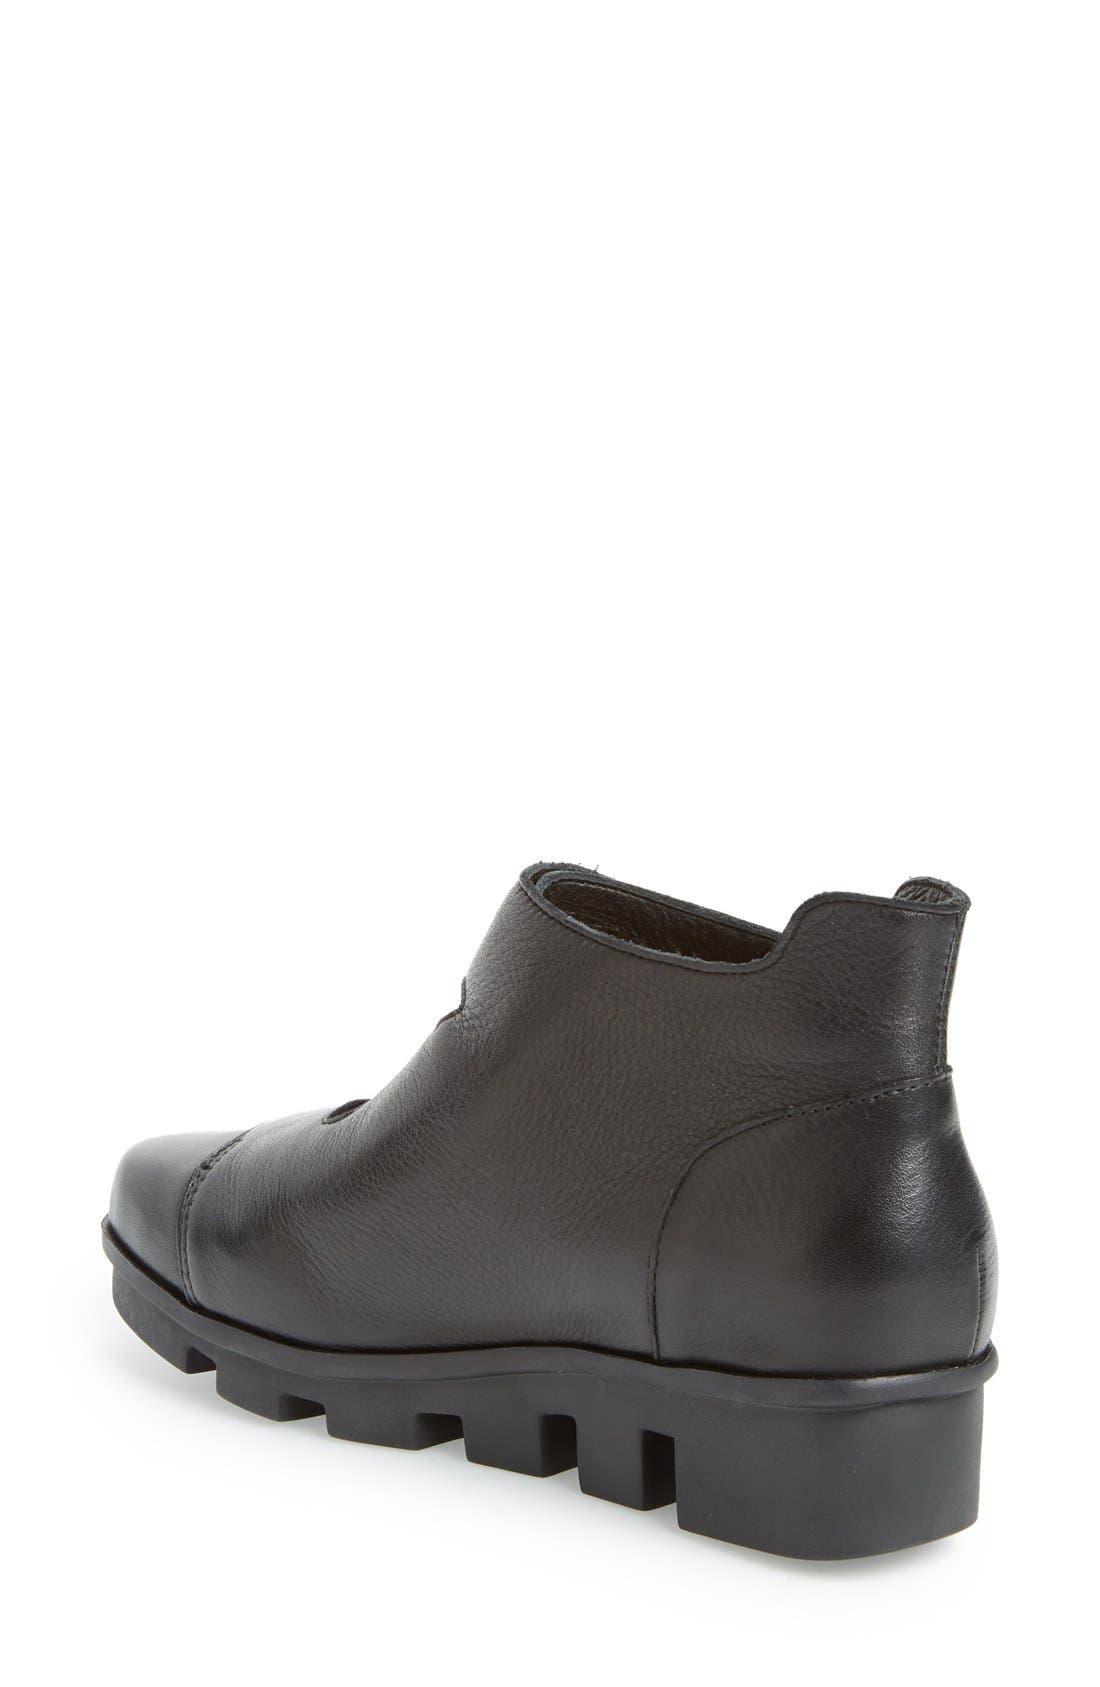 'Harmonee' Sneaker,                             Alternate thumbnail 2, color,                             Black Leather